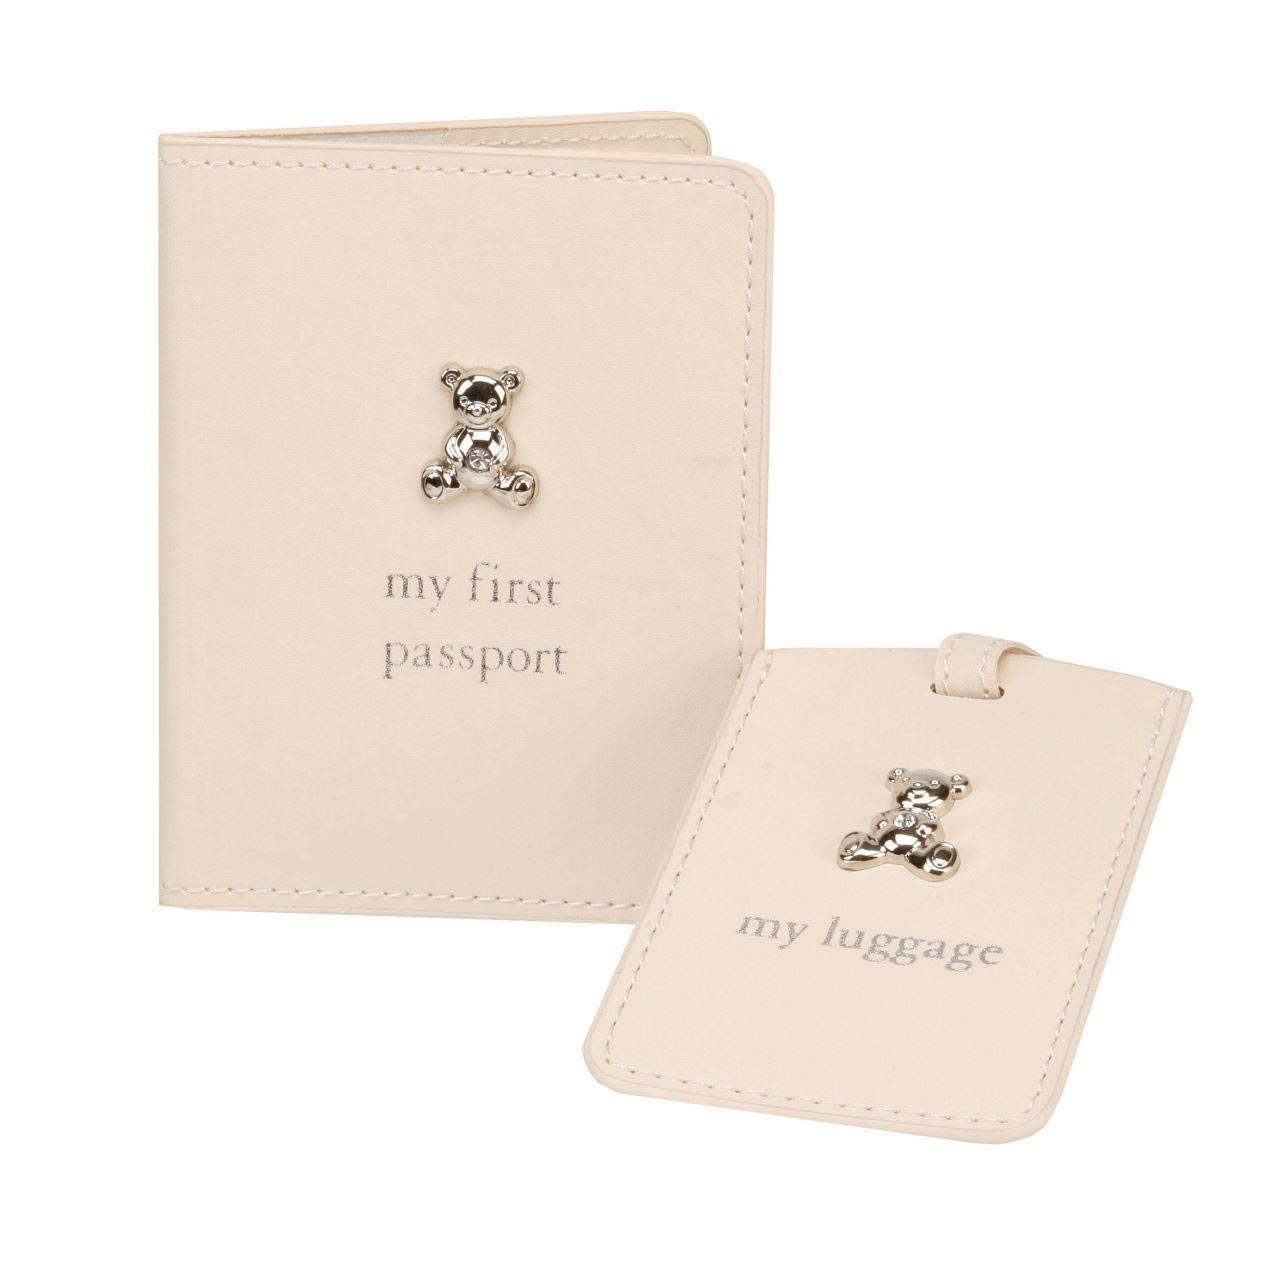 "Bambino by Juliana - Set pentru prima calatorie a bebelusului ""My First Passport and My First Luggage"""